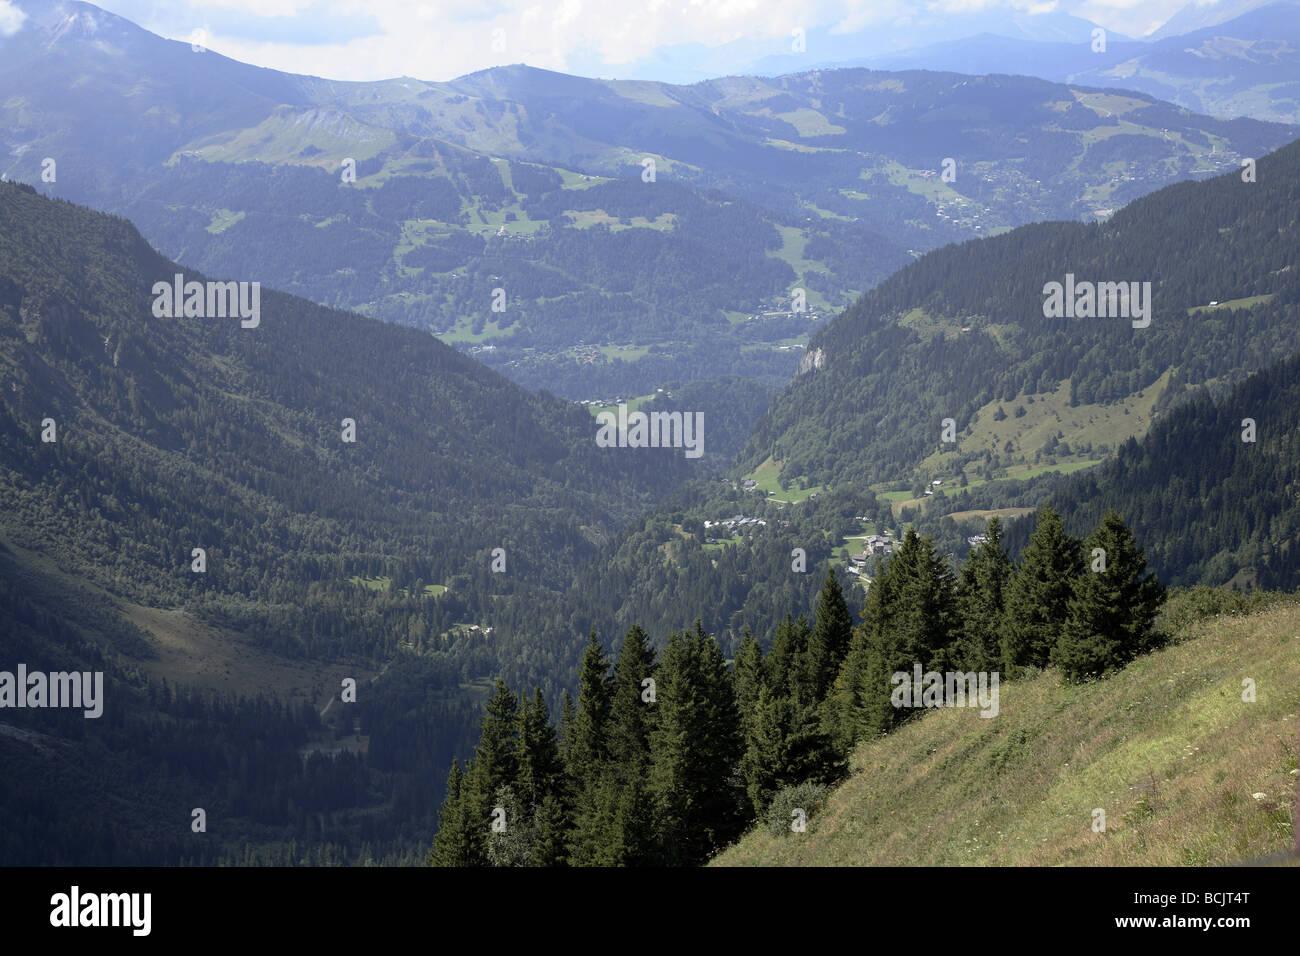 Scenery near mont blanc - Stock Image